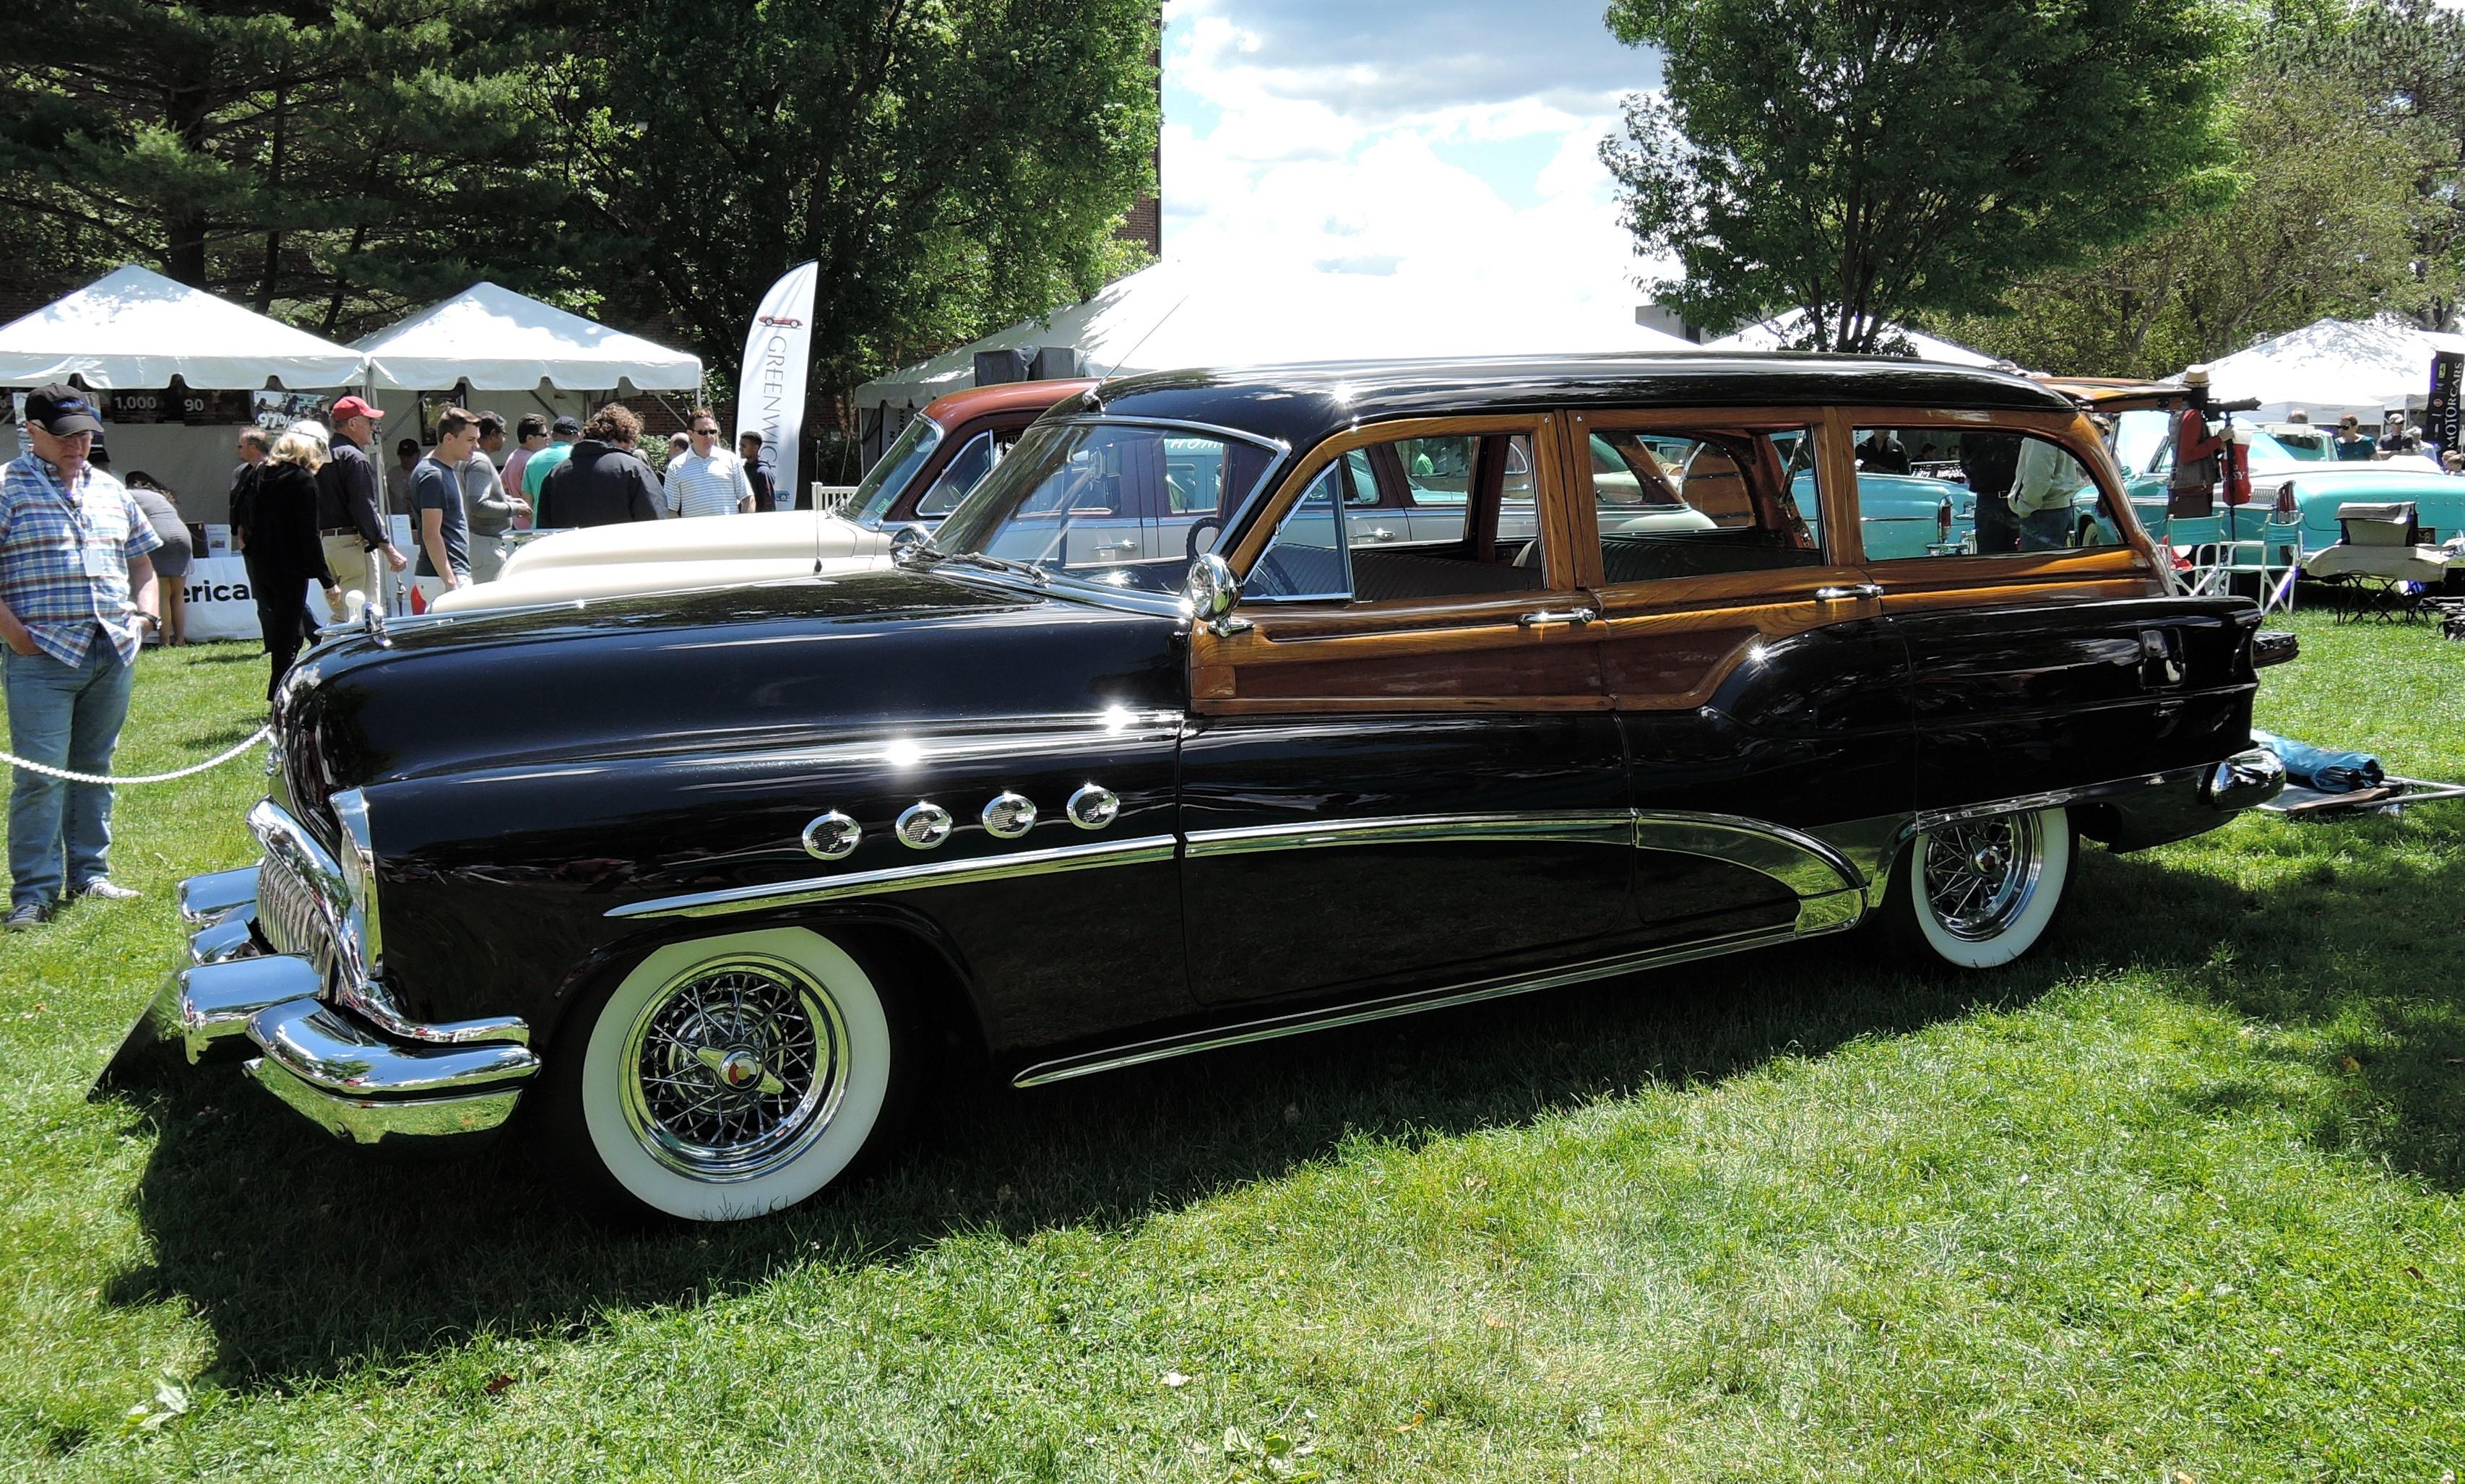 black/wood 1953 Buick Roadmaster Estate Wagon - Greenwich Concours d'Elegance 2017